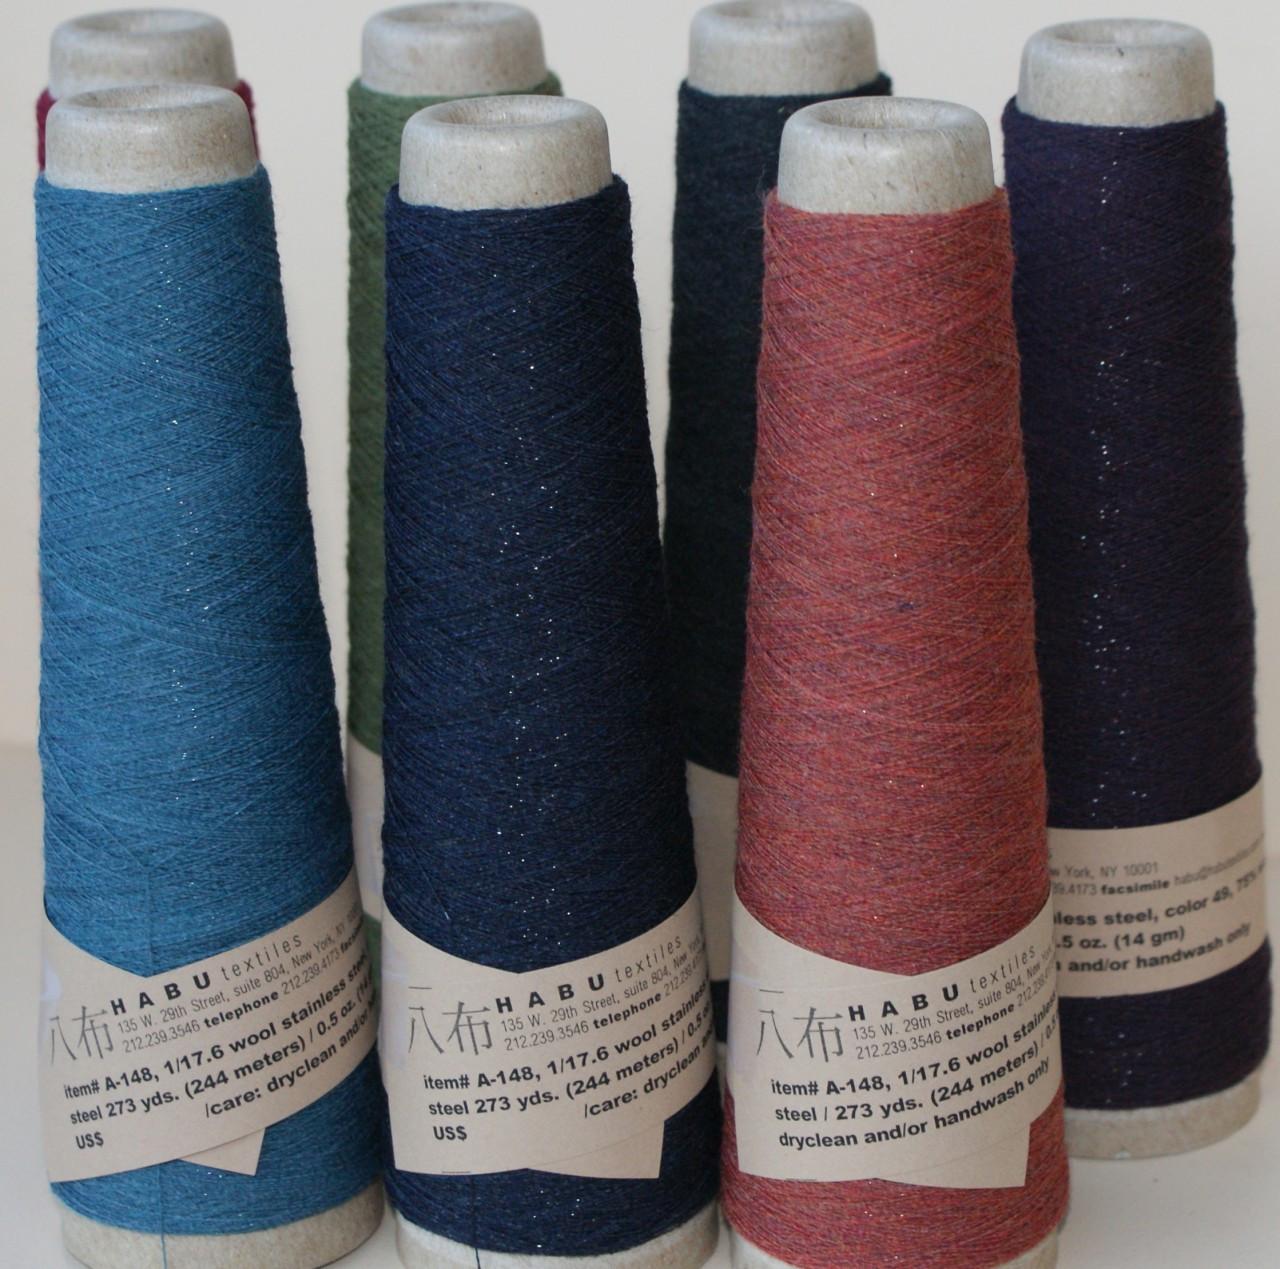 Habu Wool And Stainless Steel Yarn 1 17.6 - Hub